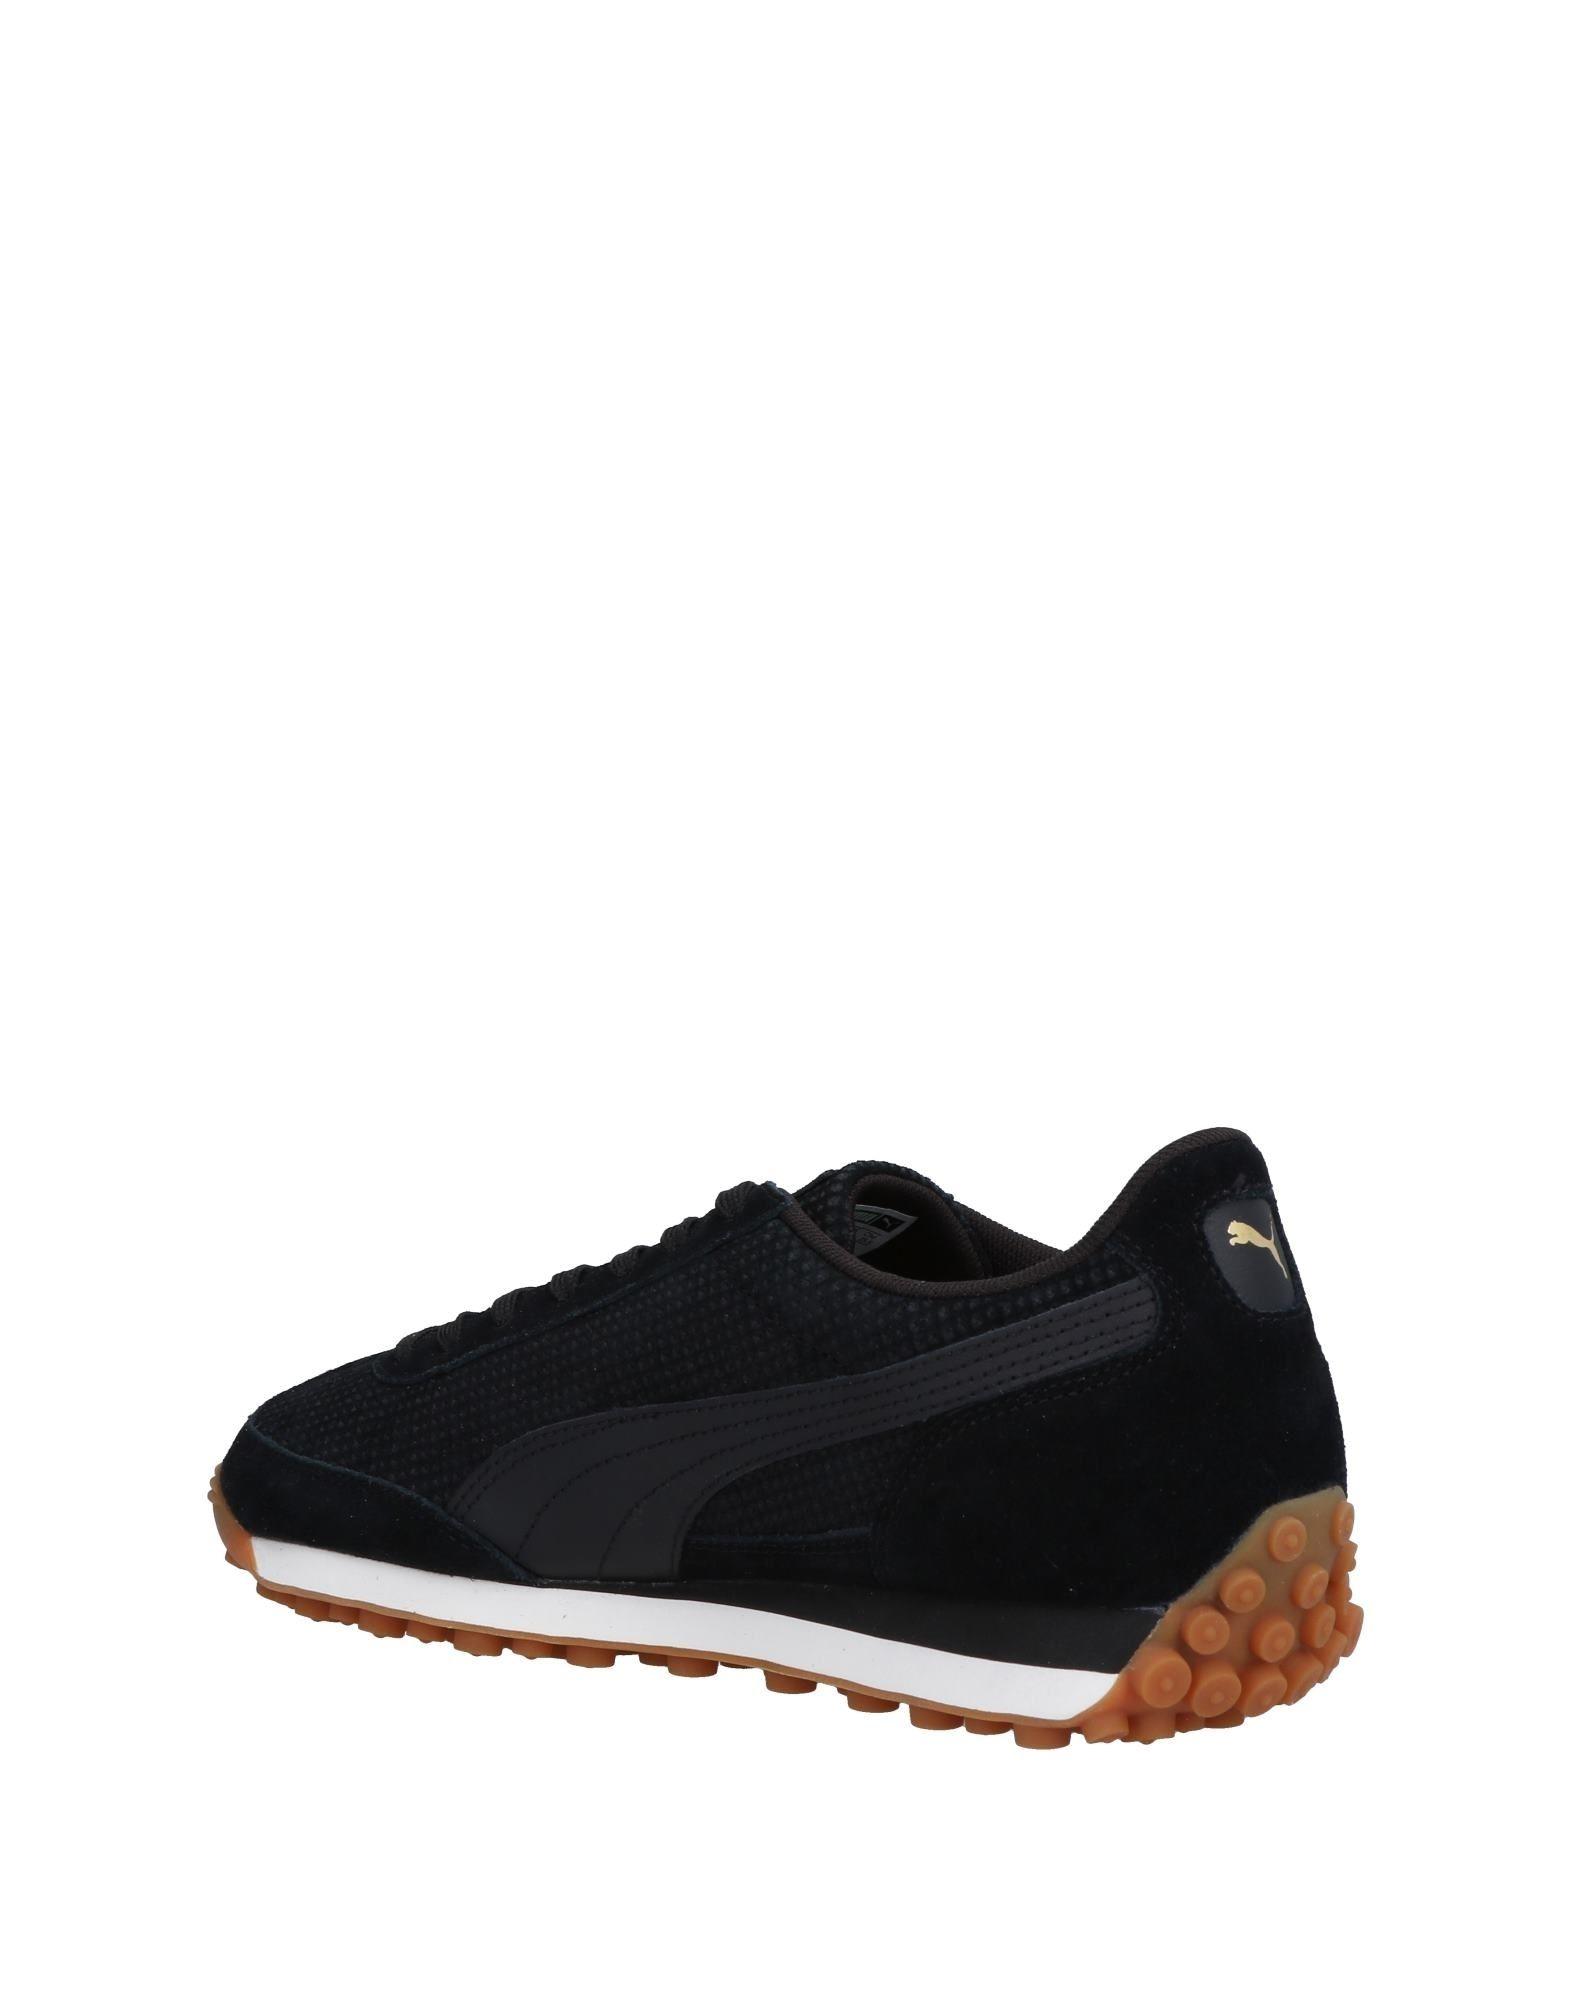 Rabatt echte  Schuhe Puma Sneakers Herren  echte 11495626AF 86db3a